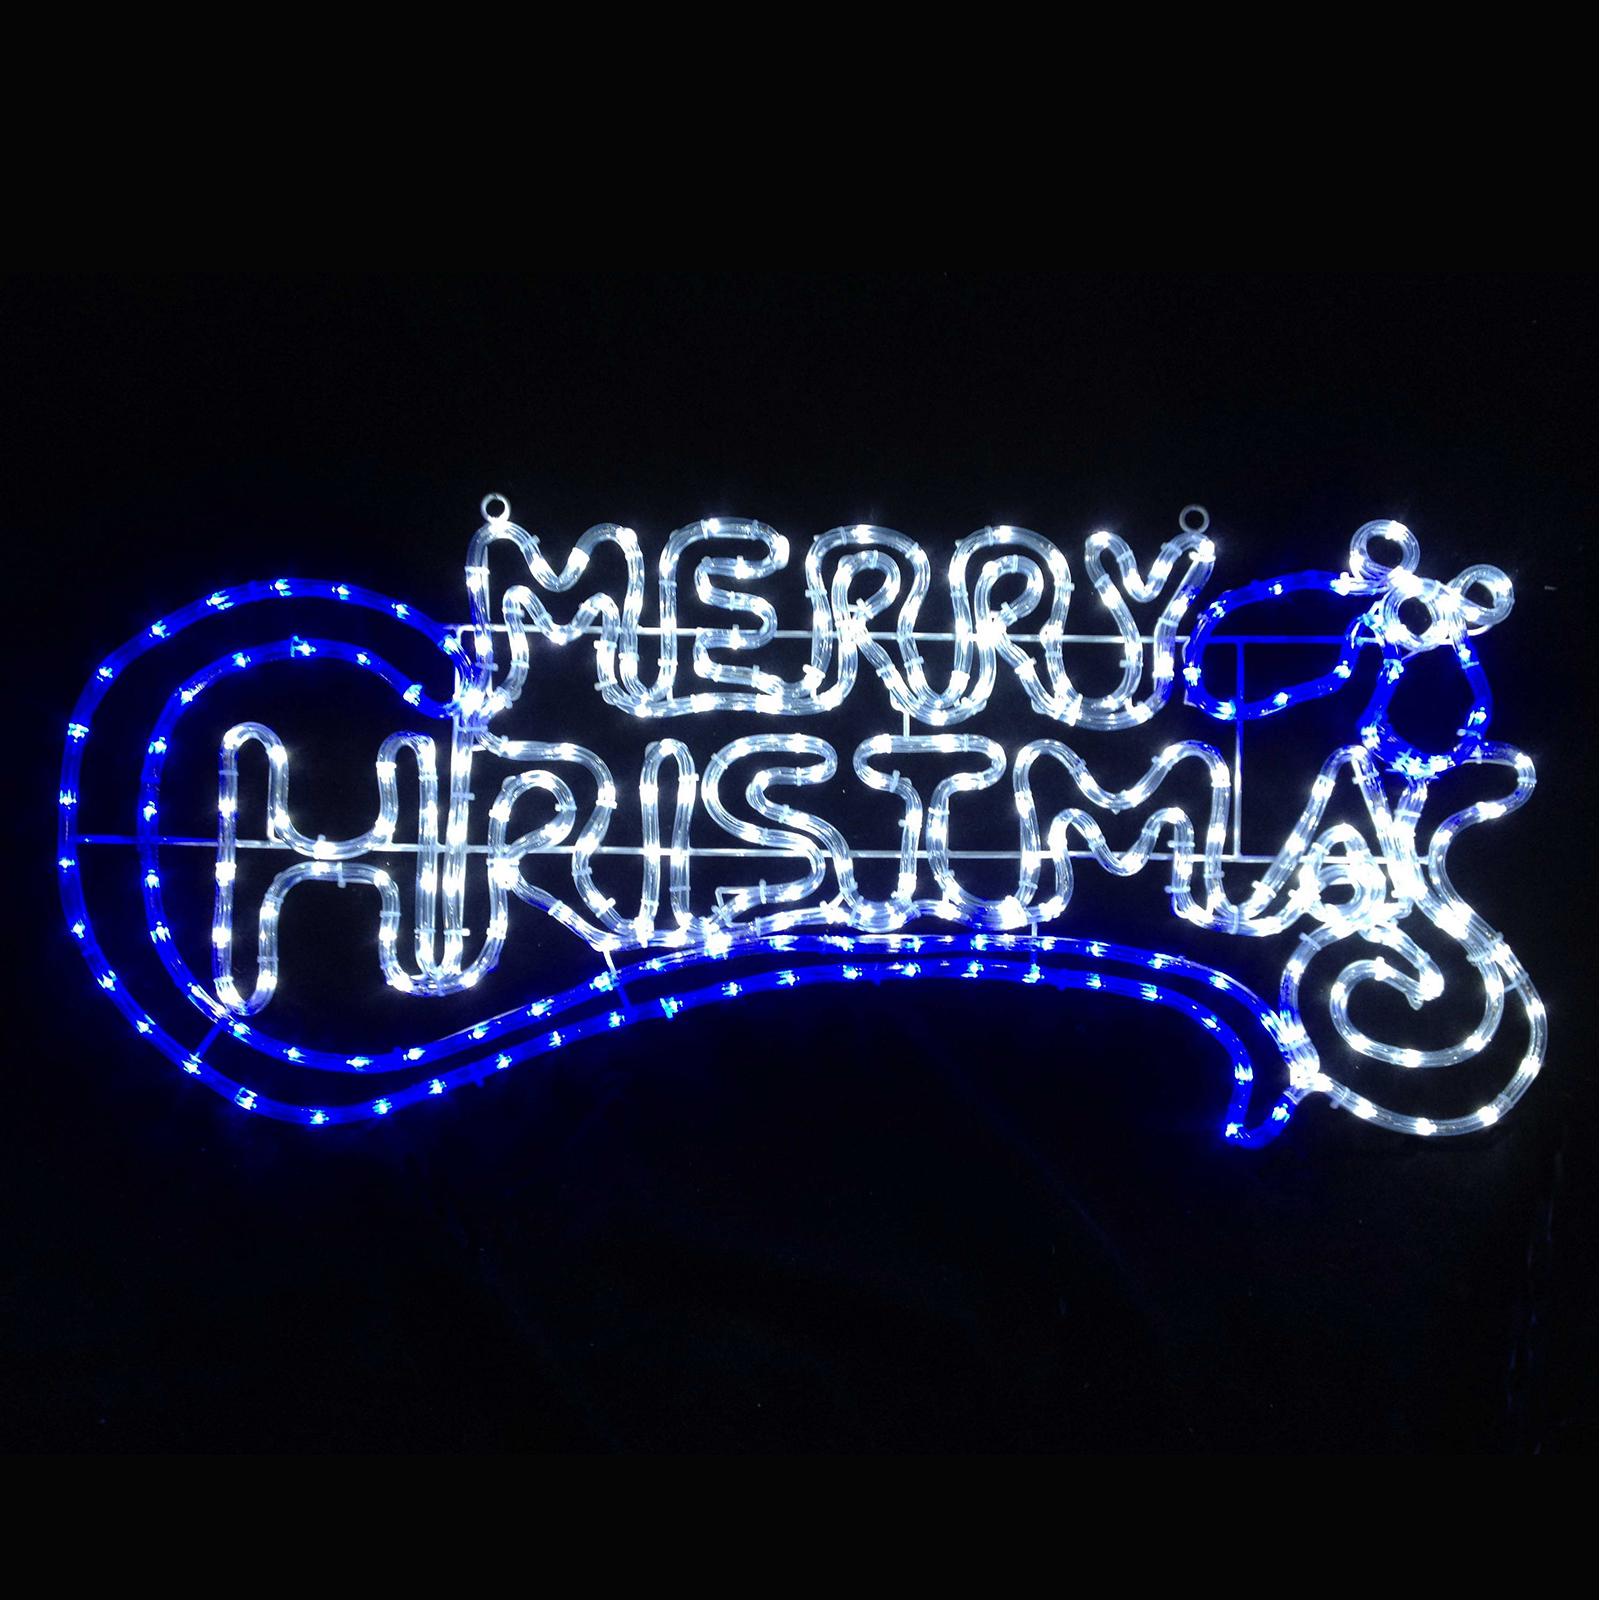 Merry Christmas Sign Blue White Rope Light Chasing LED Decoration Xmas